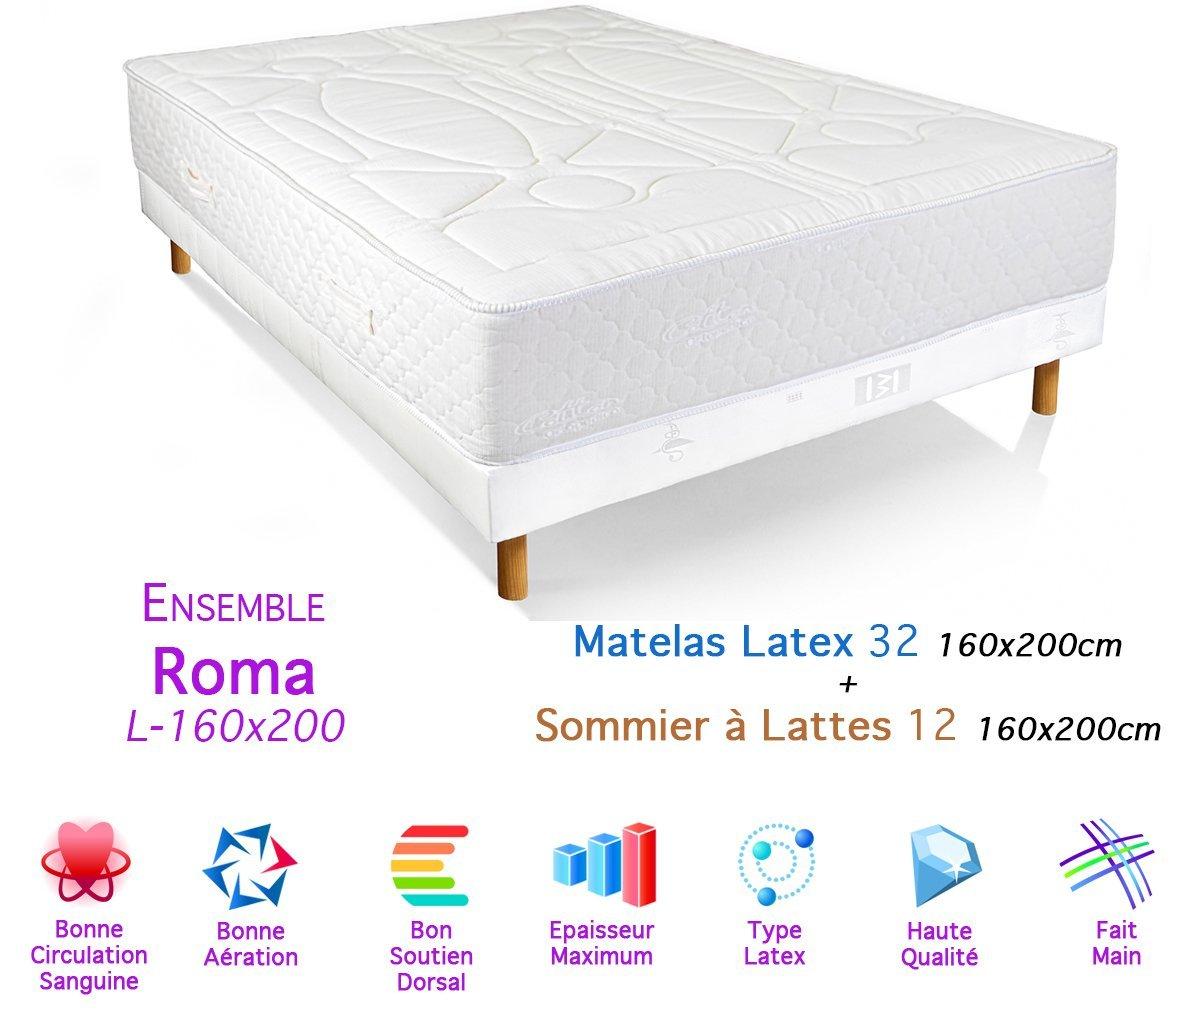 Conjunto de somier Roma Colchón látex 32/12, 160 x 200 cm: Amazon.es: Hogar